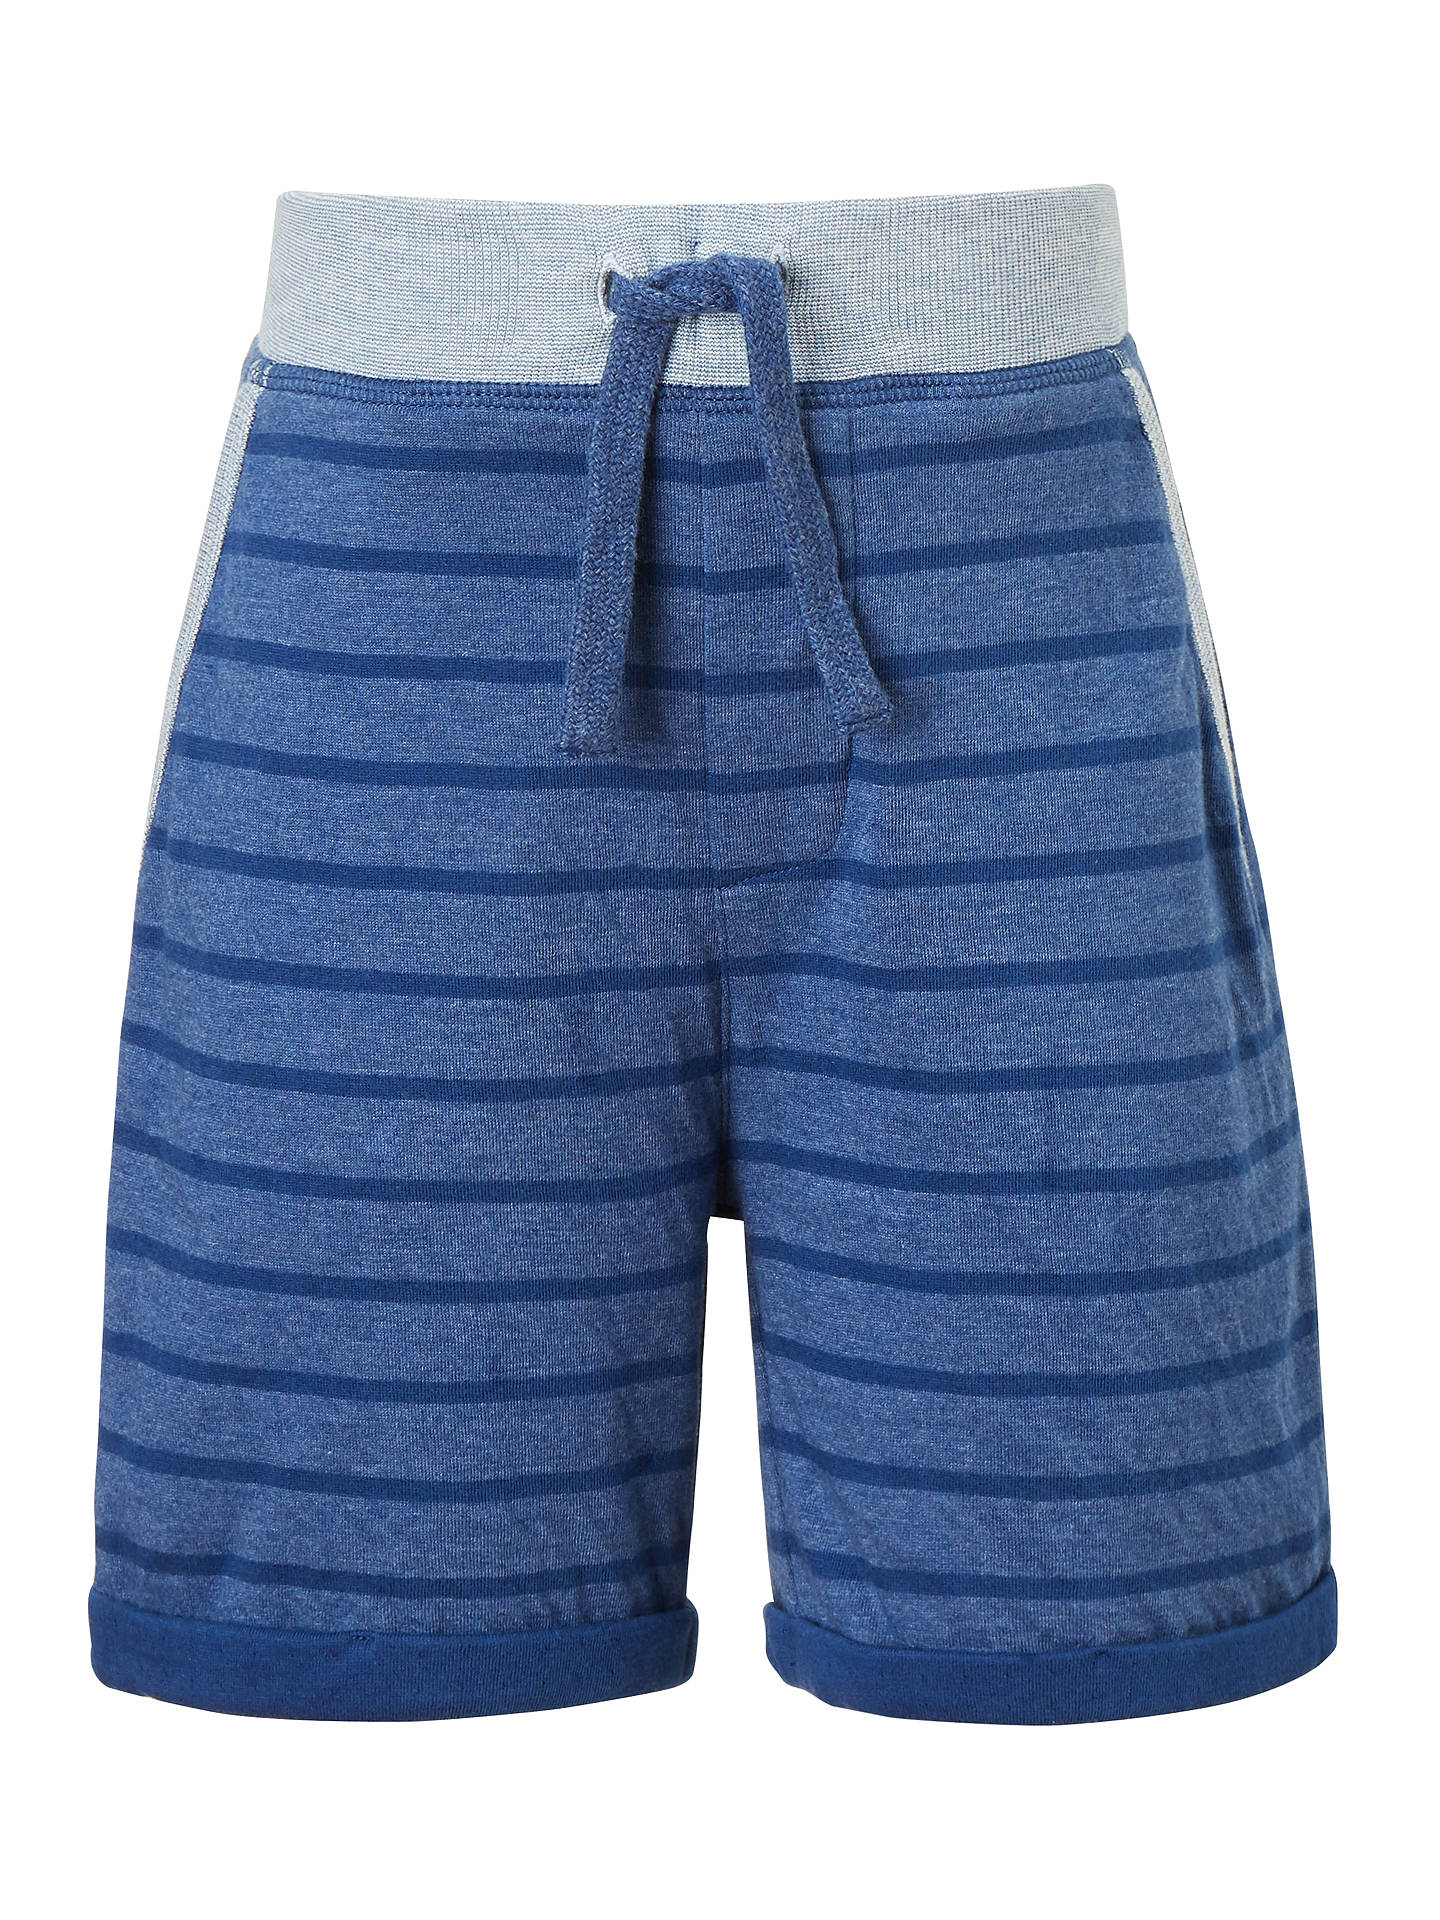 Boys pyjama MINI BODEN long john age 4 5 6 7 9 11 12 years red striped